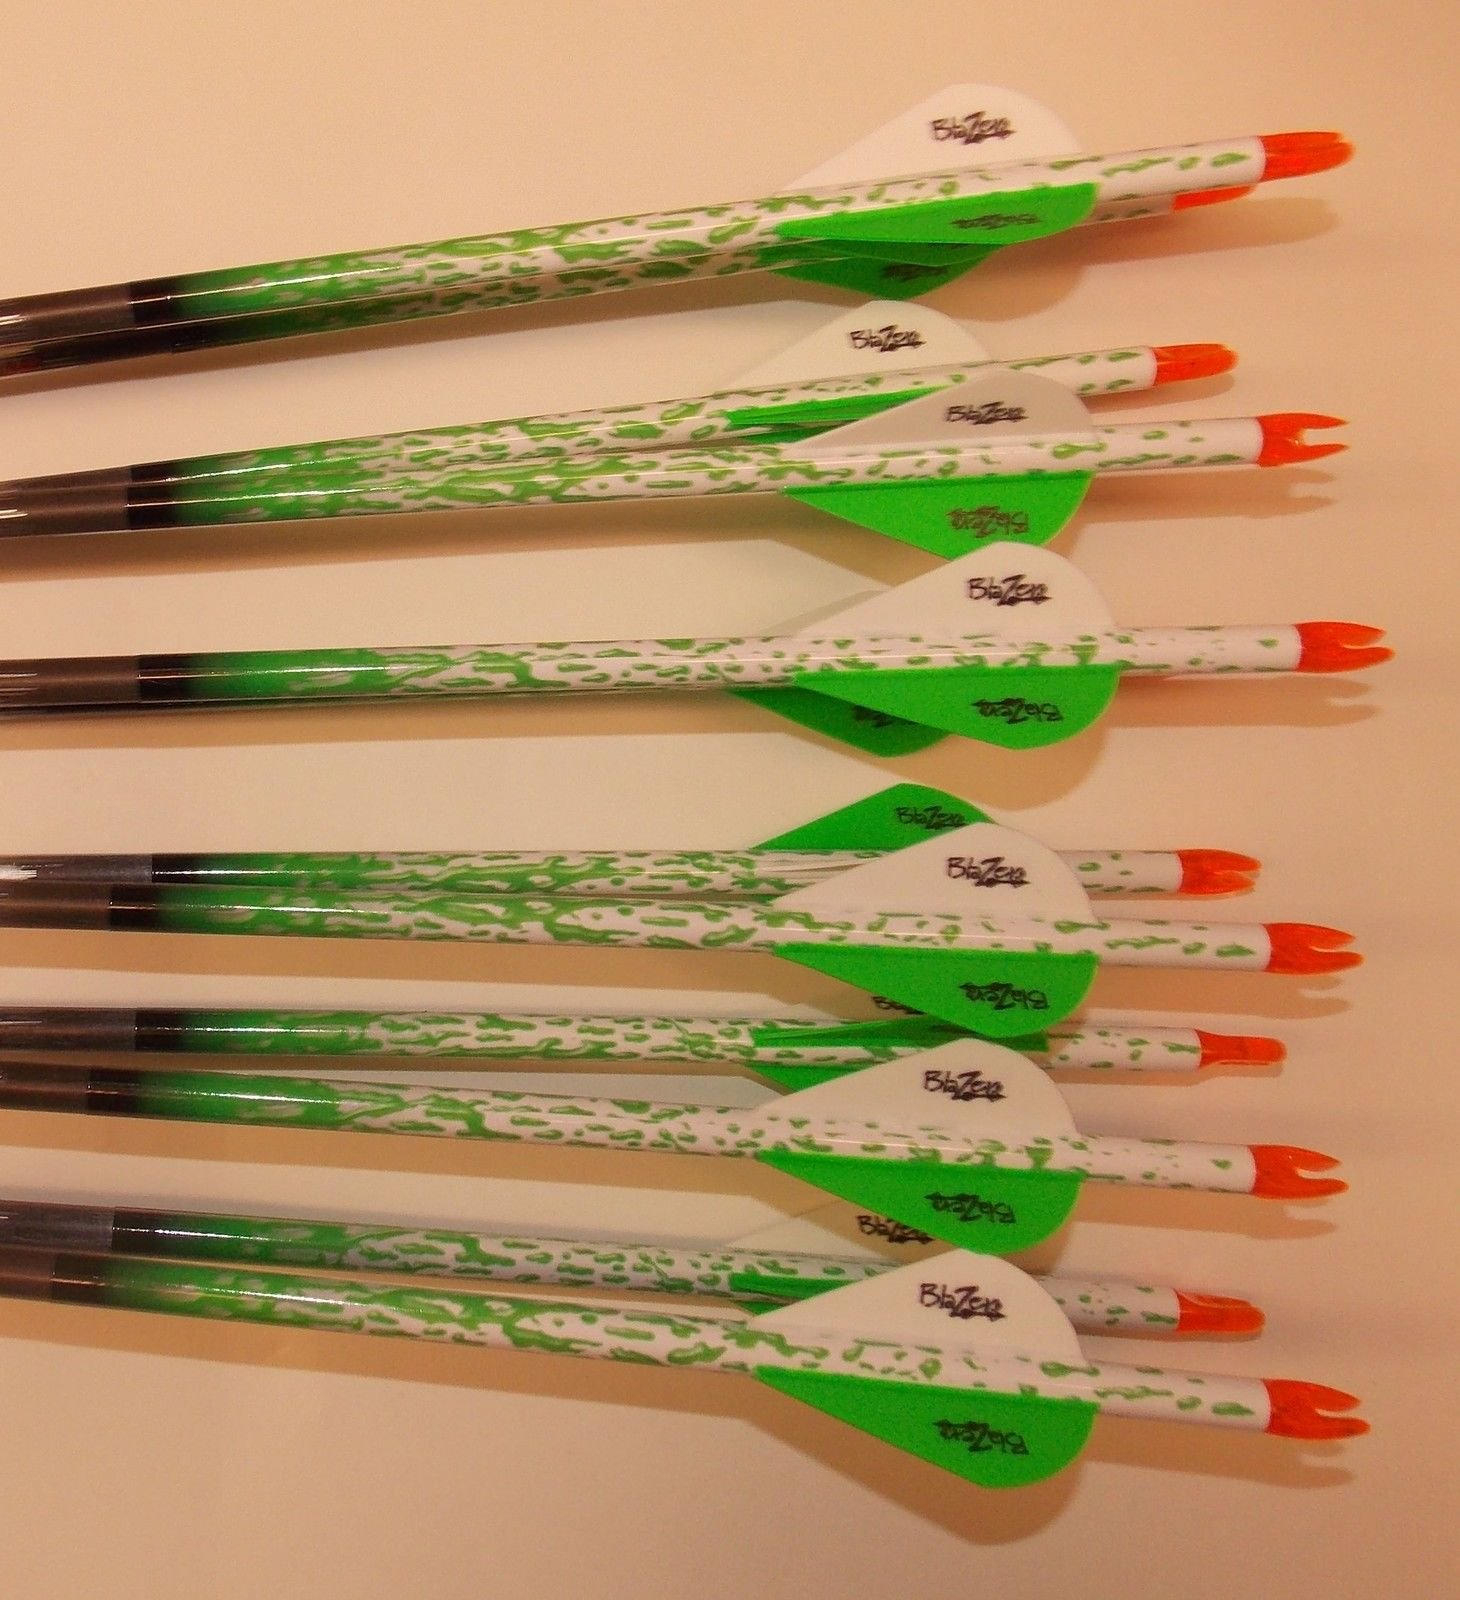 Beman ICS Percision Hunter 340 Carbon Arrows w/Blazer Vanes Bullseye Rain Wraps 1 Dz.